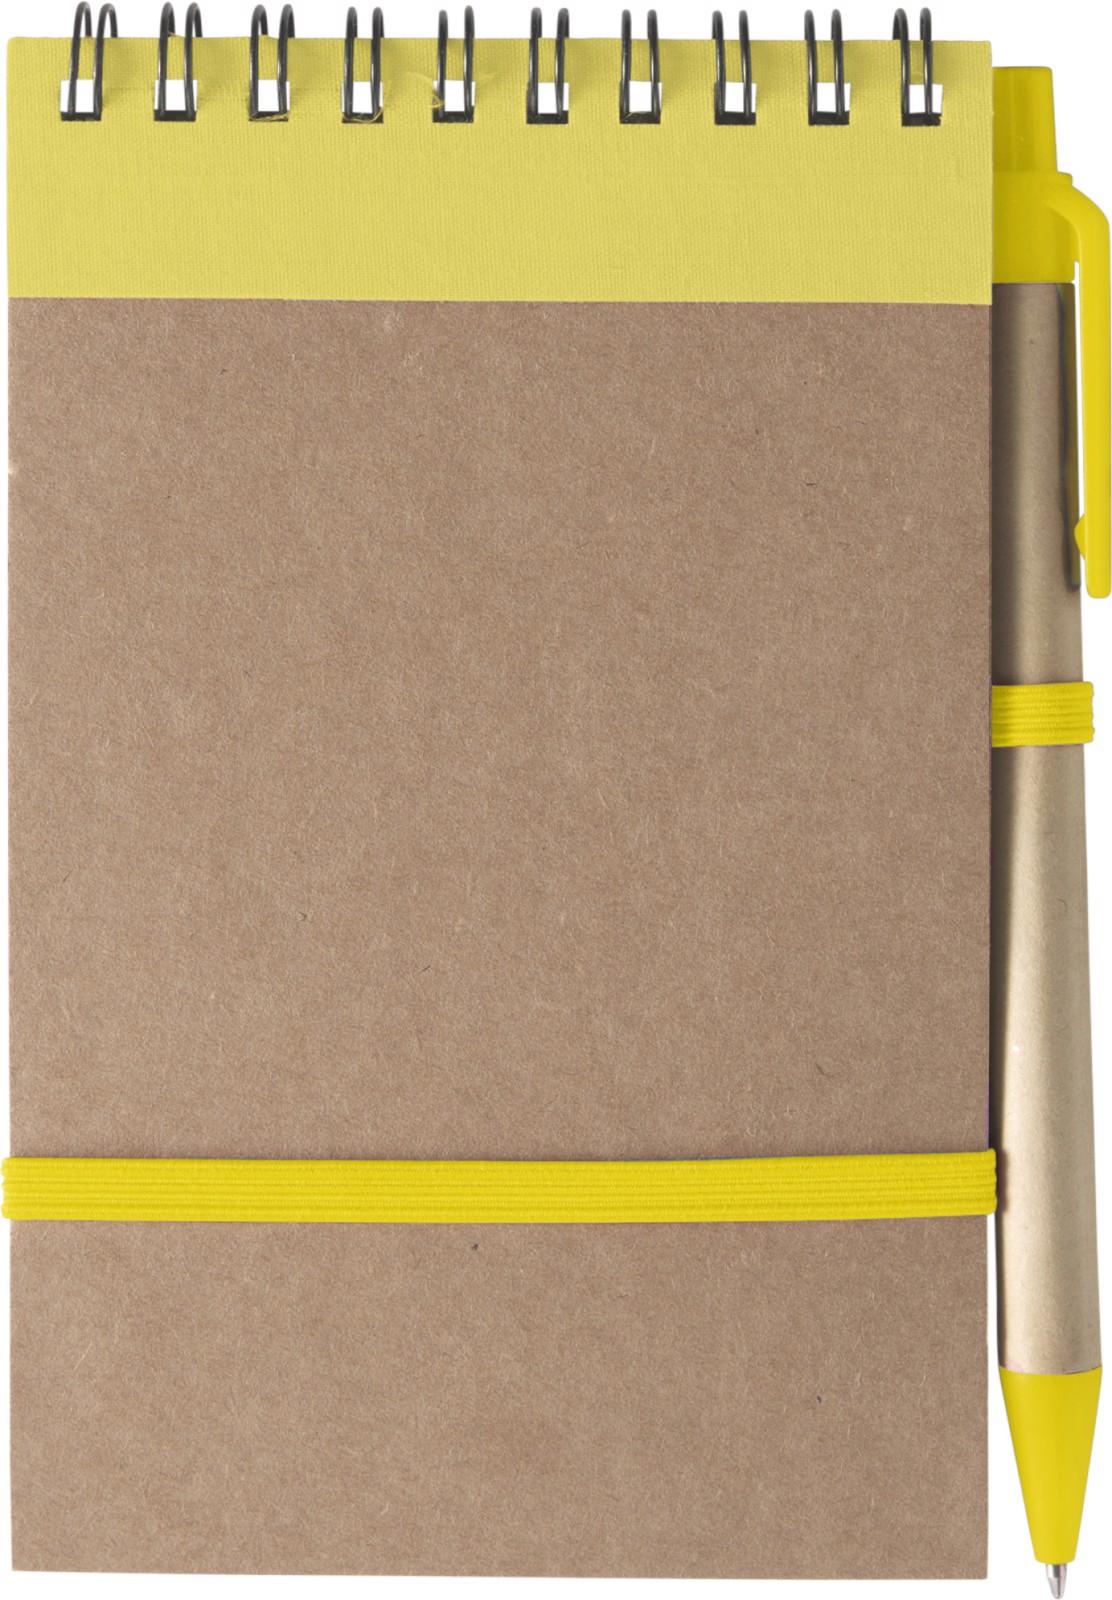 Bloc de notas de cartón y bolígrafo - Yellow